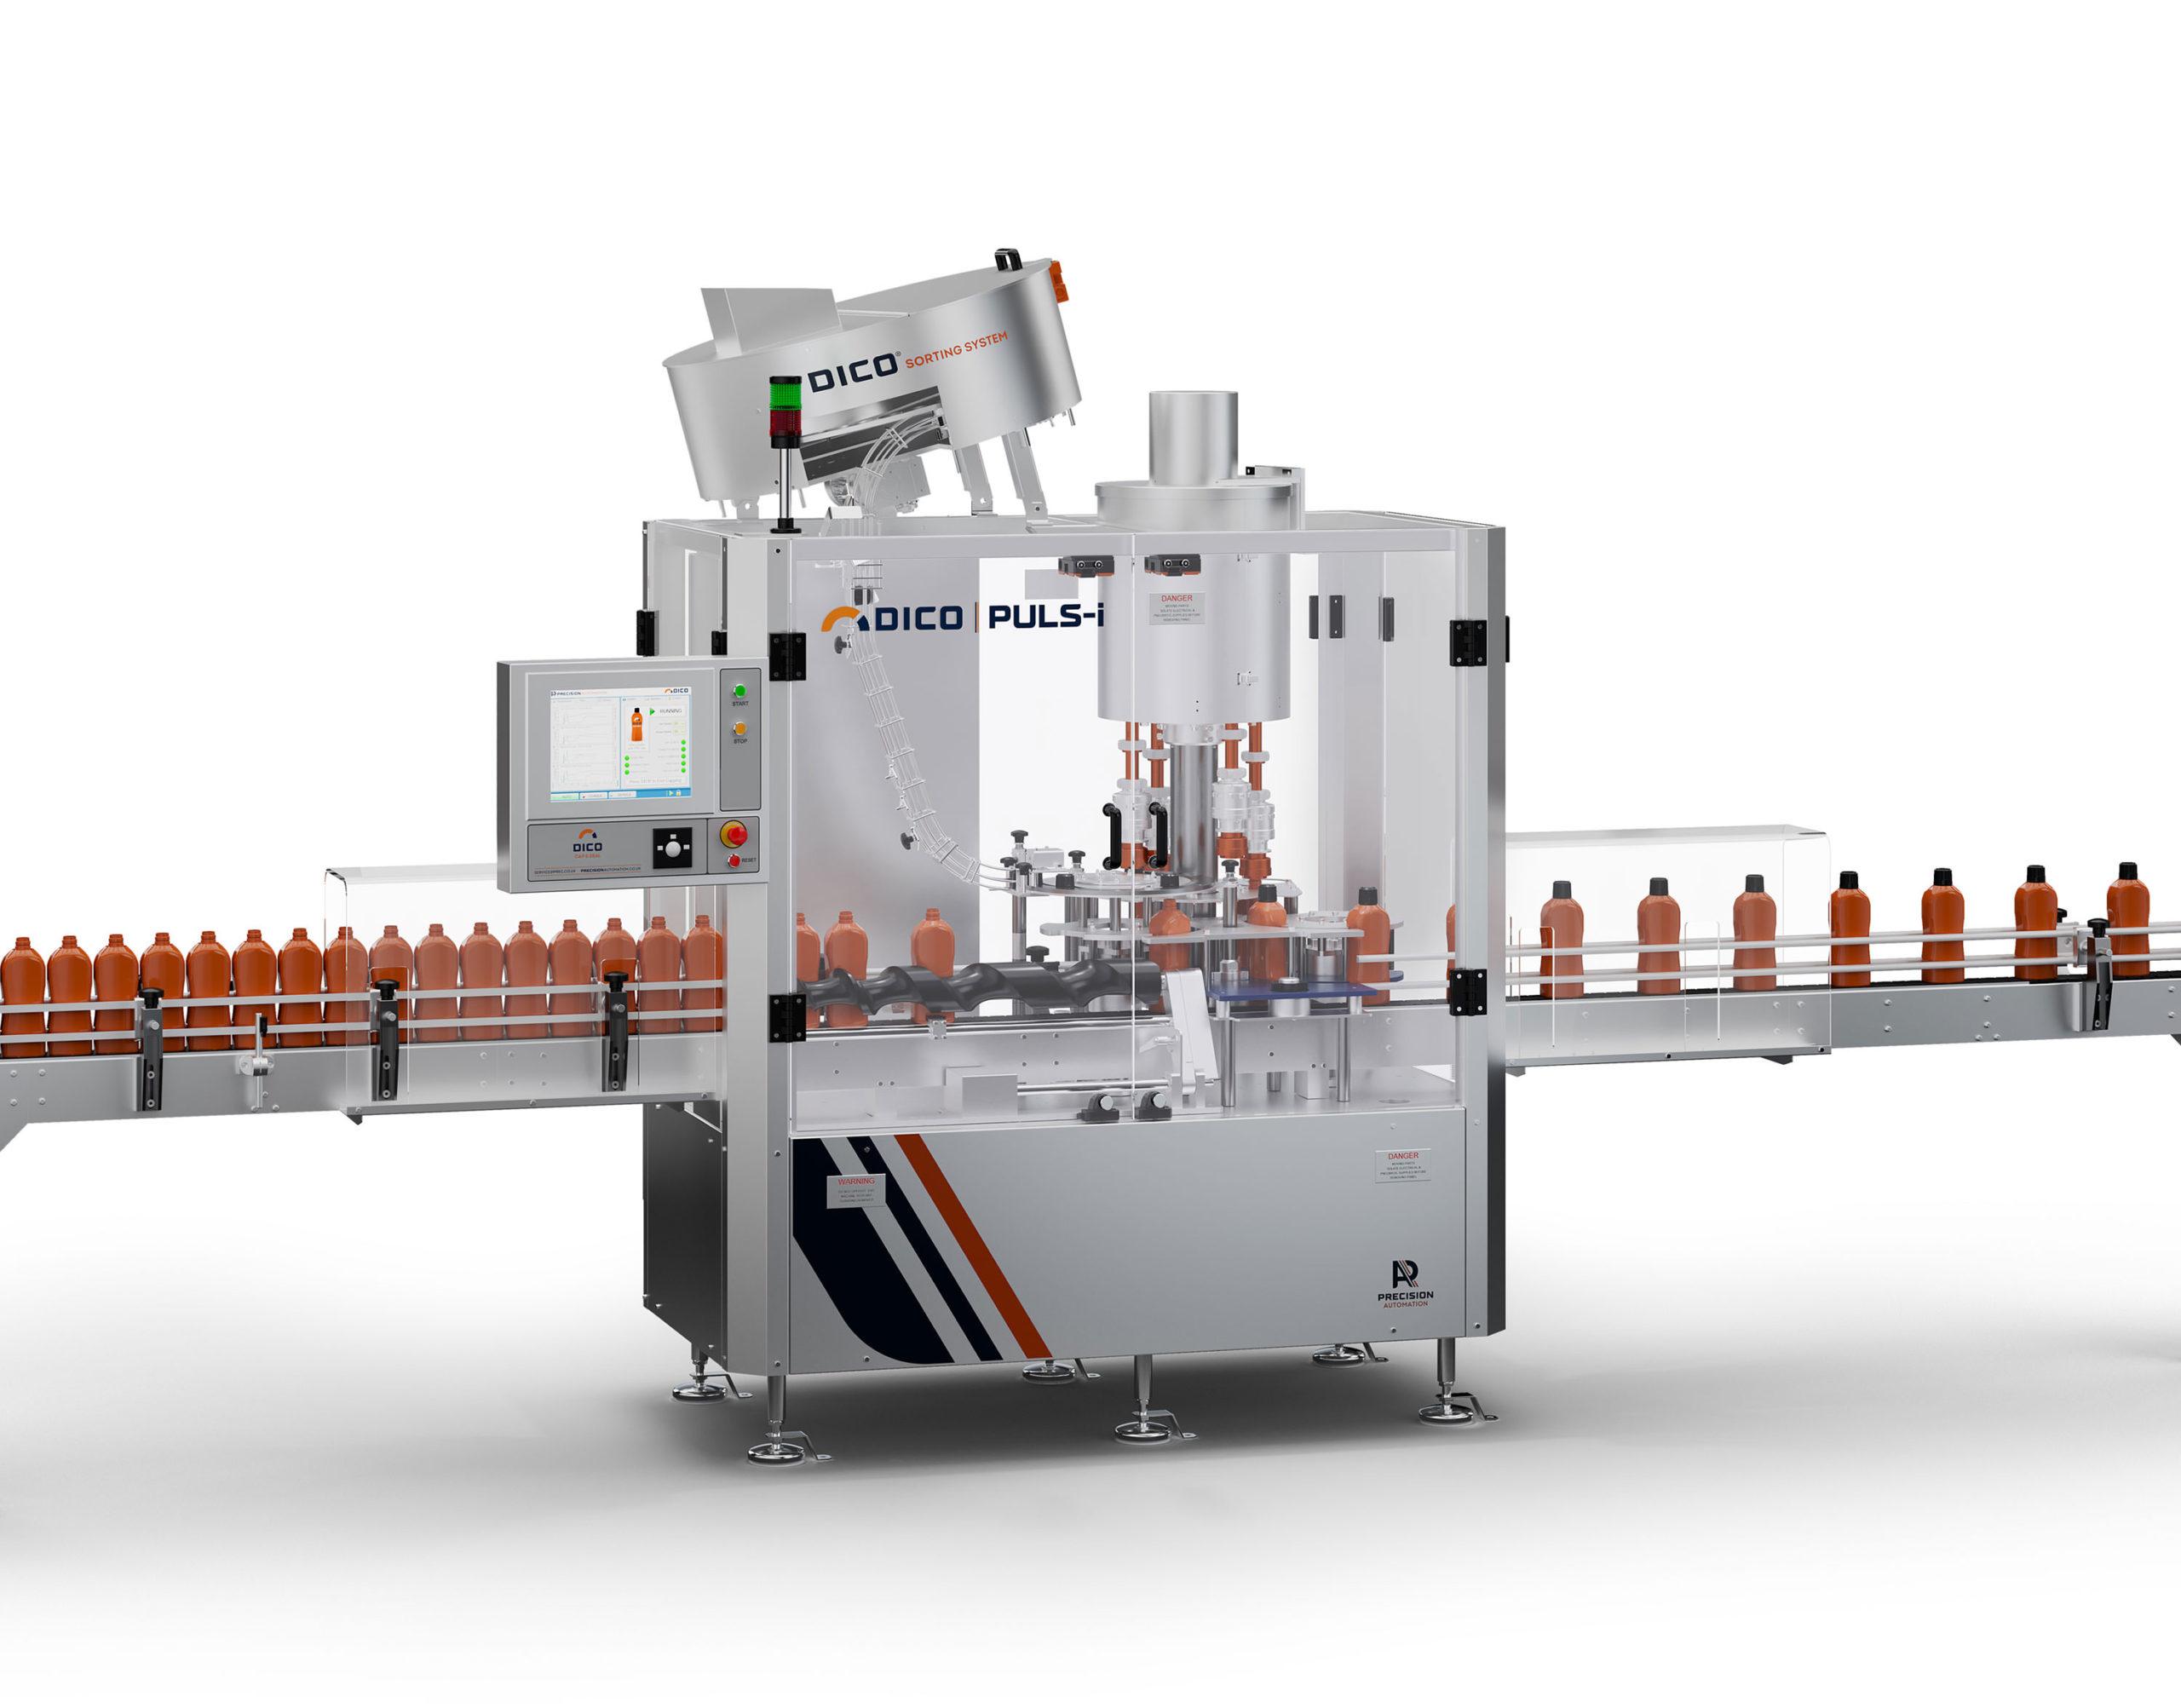 Precision Automation Dico Puls-i cam driven capping machine